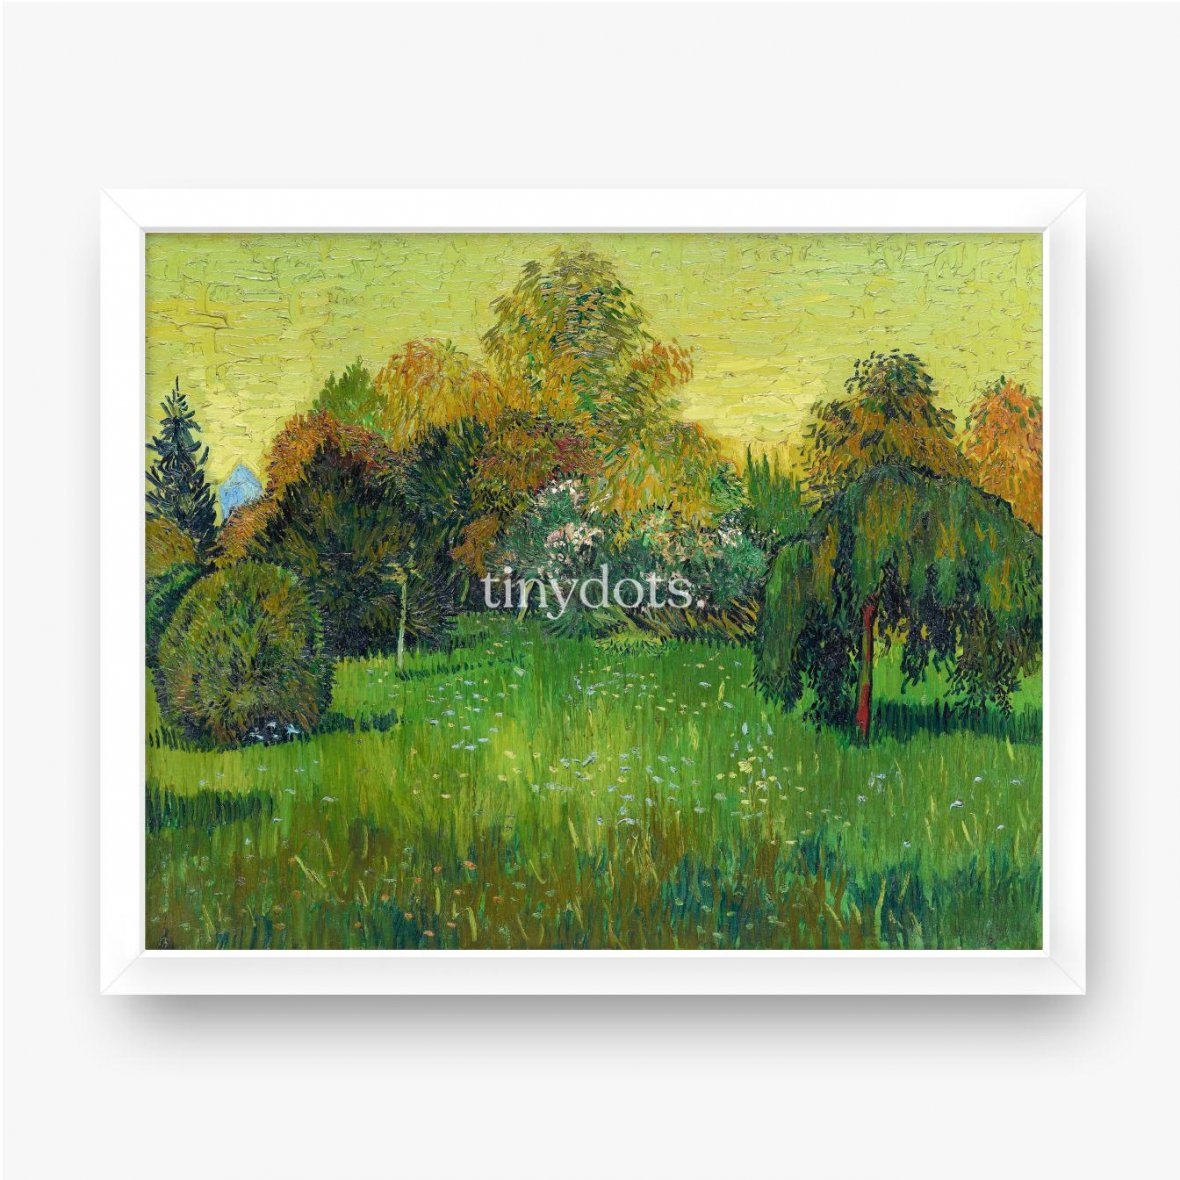 Gerahmtes Poster Vincent van Gogh, Der Dichtergarten, 1888